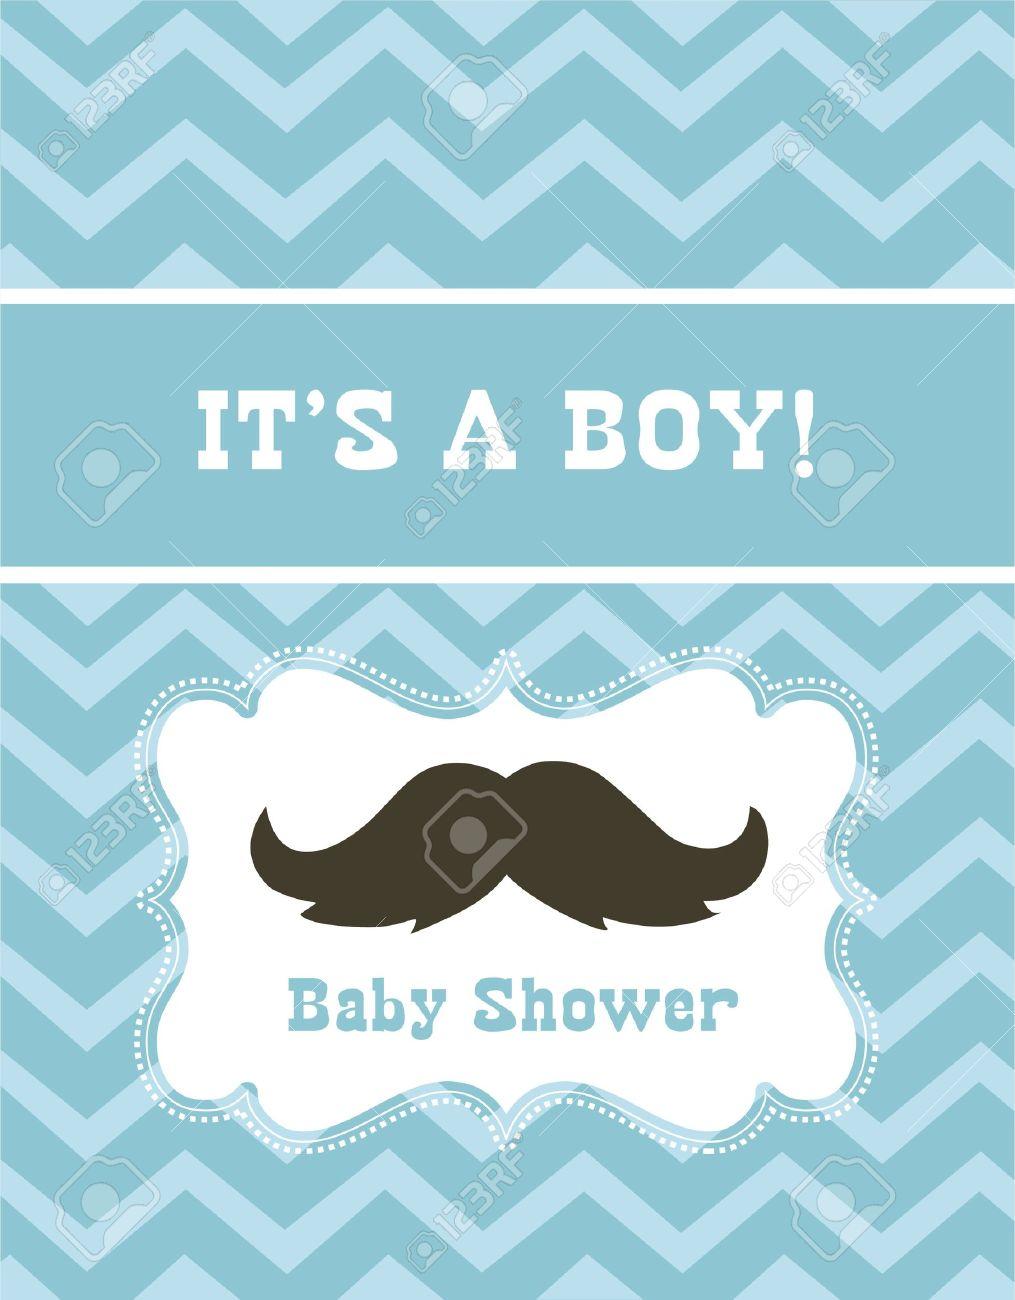 Baby Boy Shower Vector Illustration Royalty Free Cliparts Vectors